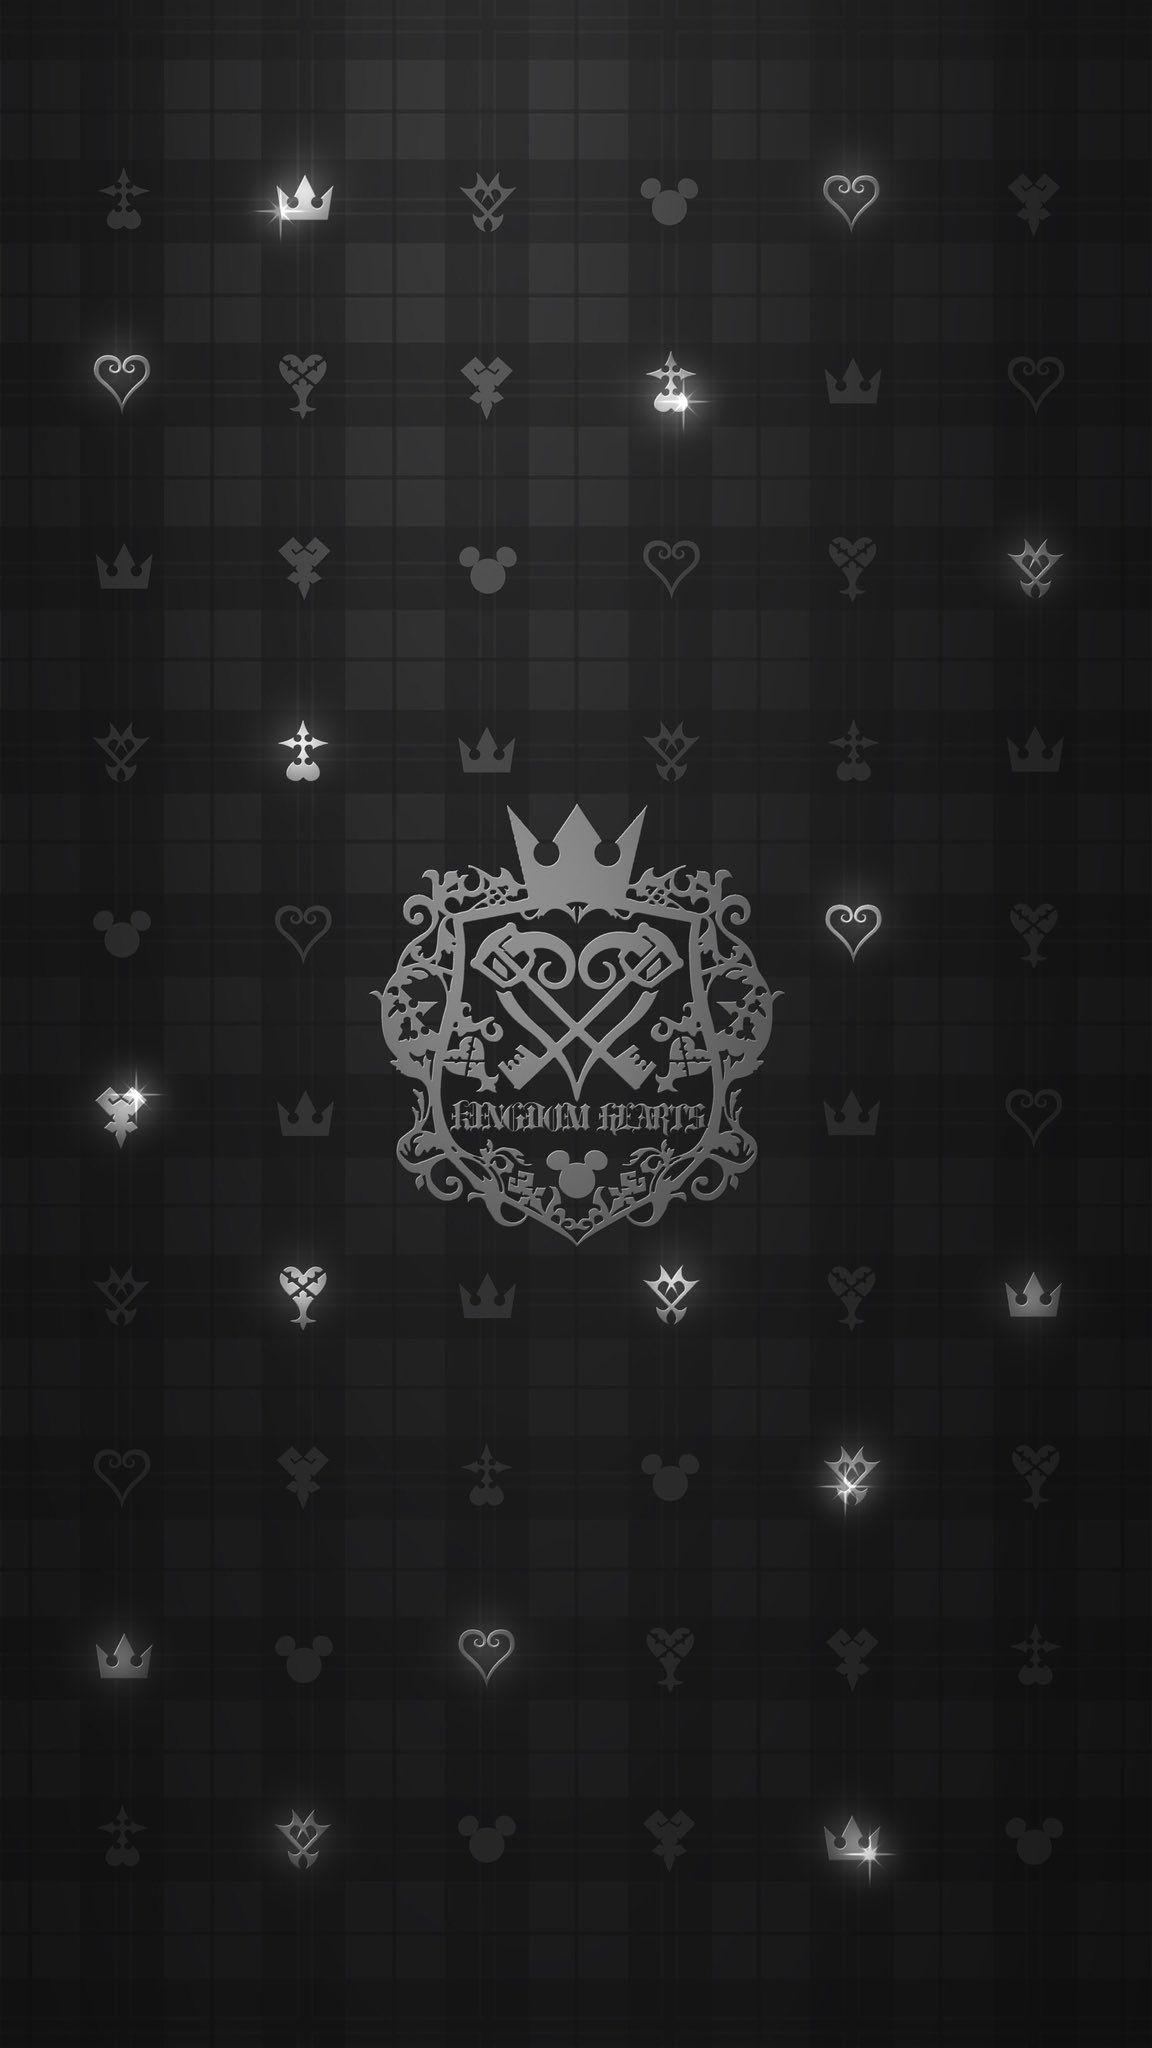 Kingdom Hearts Kingdom Hearts Wallpaper Kingdom Hearts Heart Wallpaper